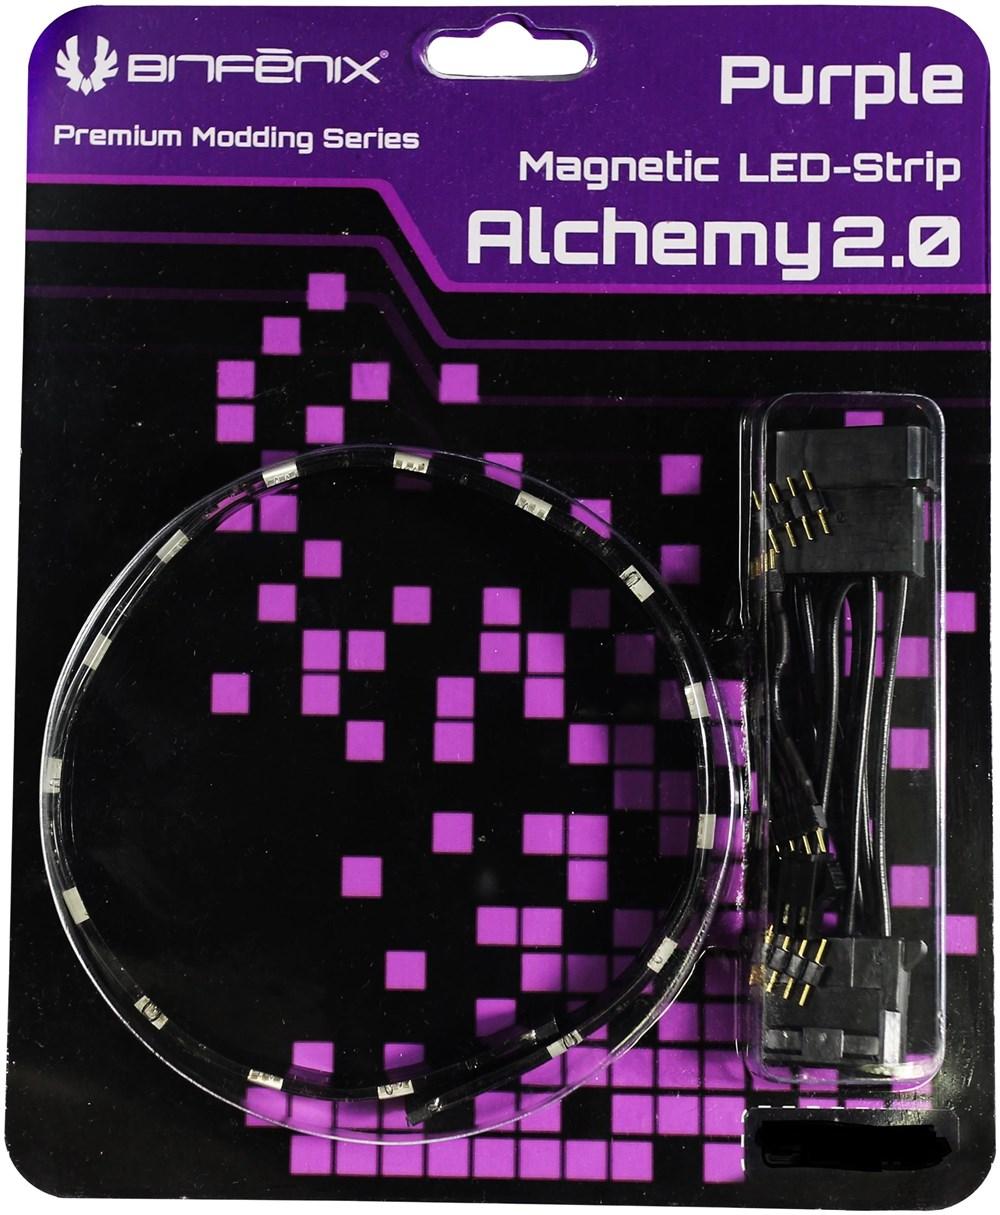 BitFenix Alchemy 2.0 Magnetic LED-Strip 60cm / 30 LEDs / violett - Preisvergleich